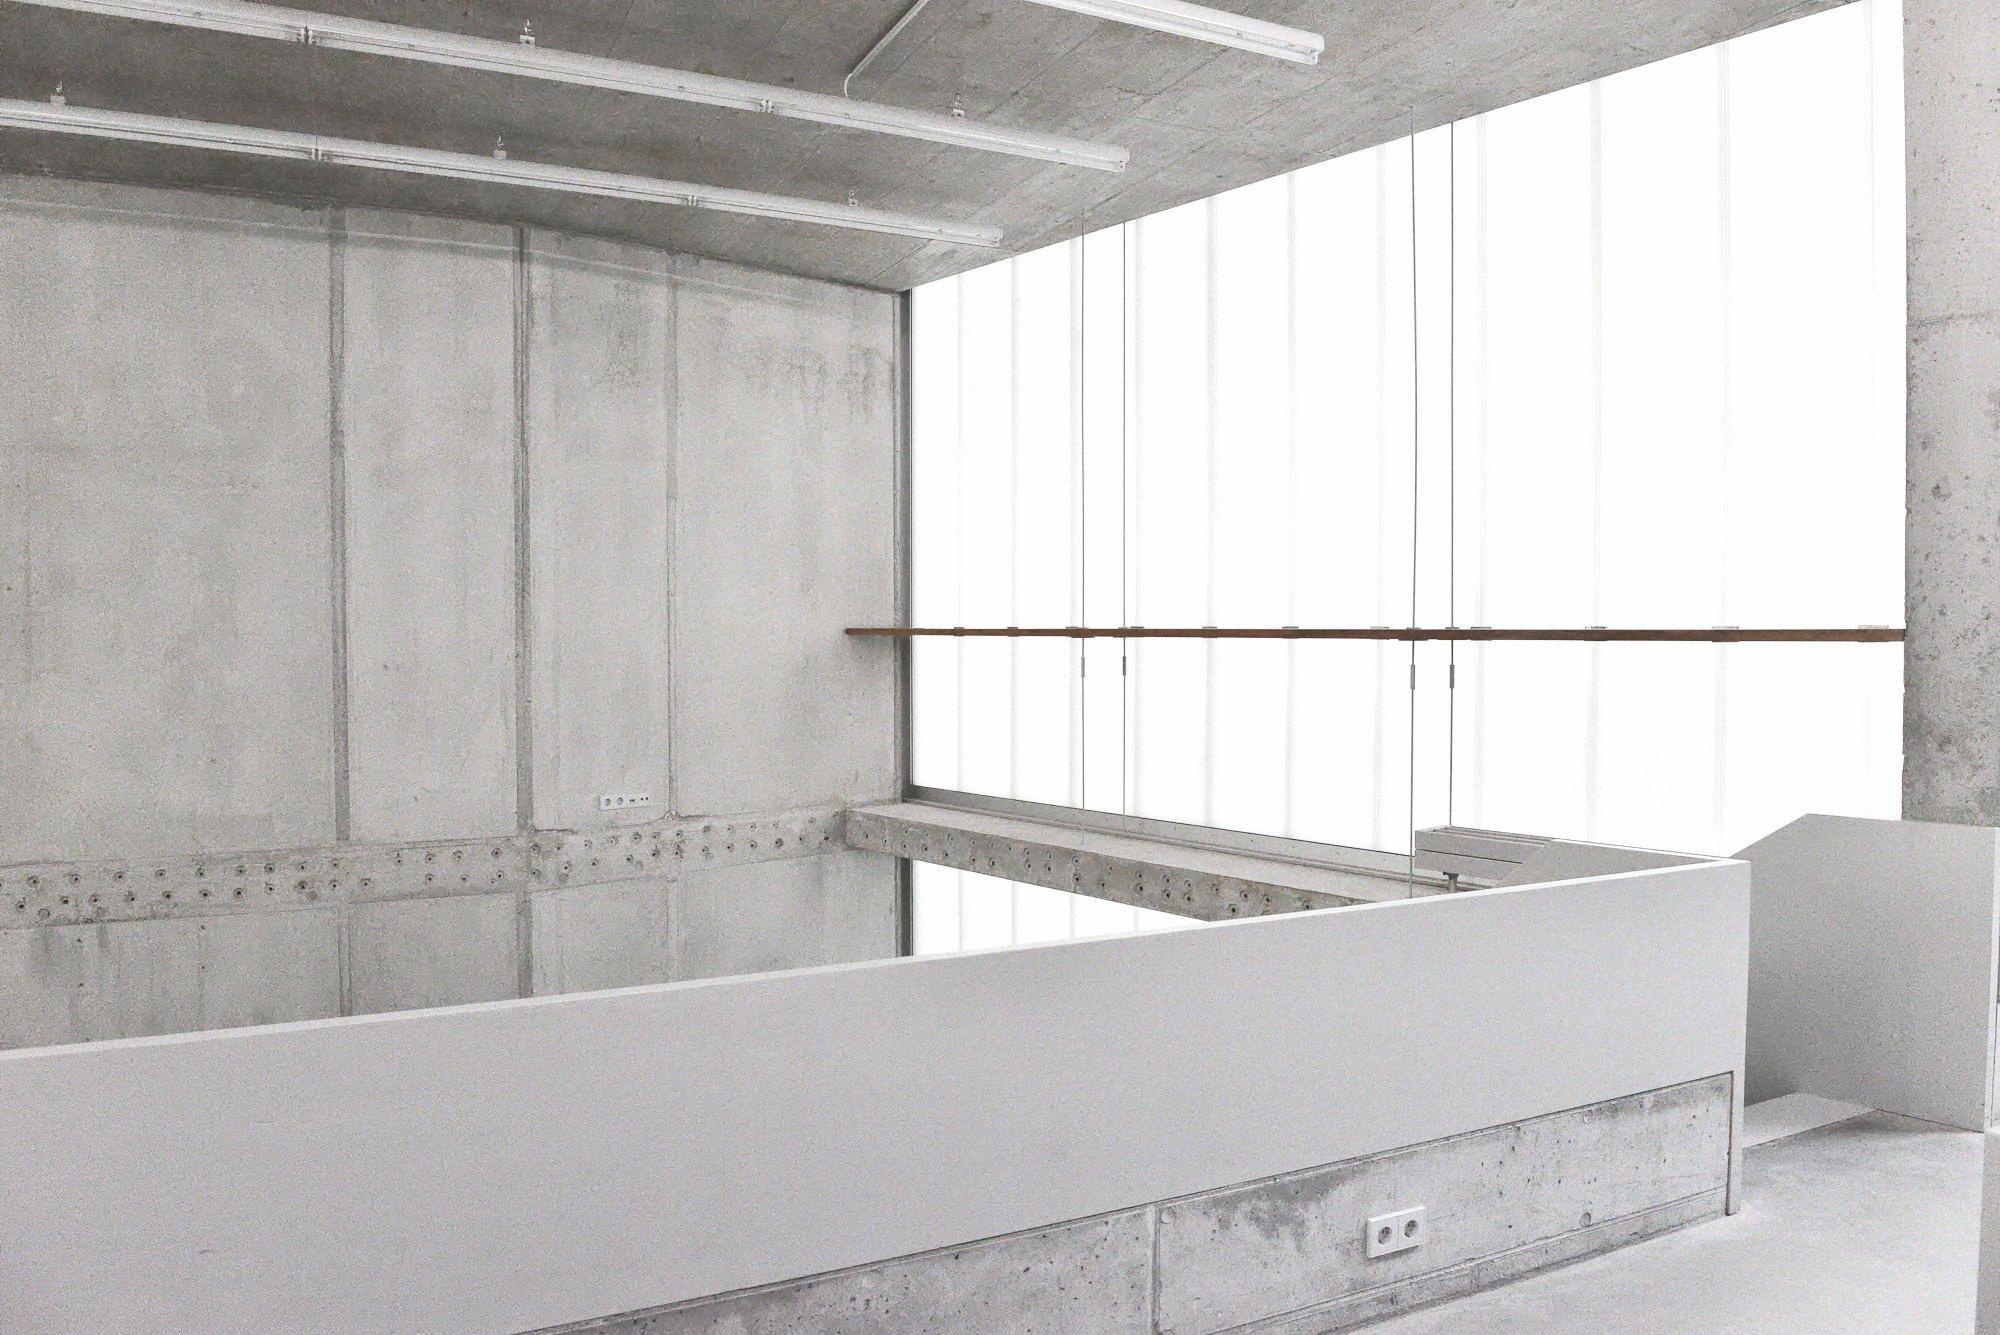 Architekt Arno Brandlhuber Fur Audi City Berlin Studio Schoen Laut